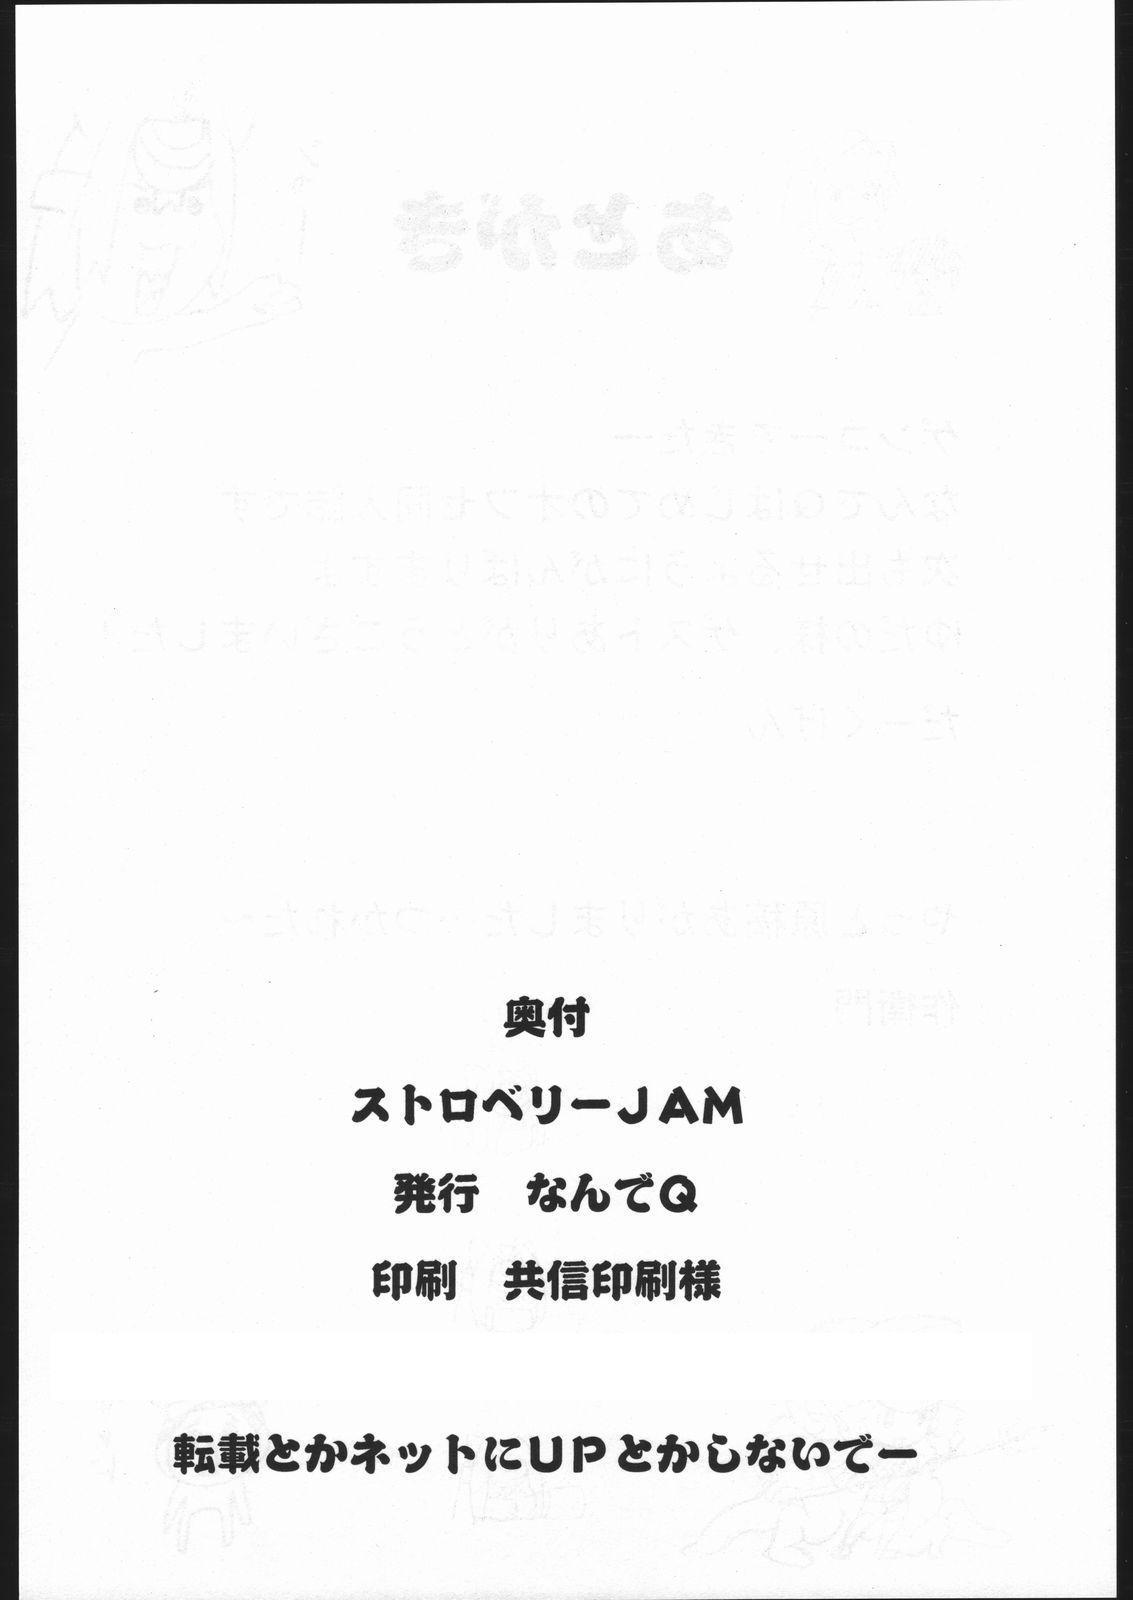 Strawberry Jam 24